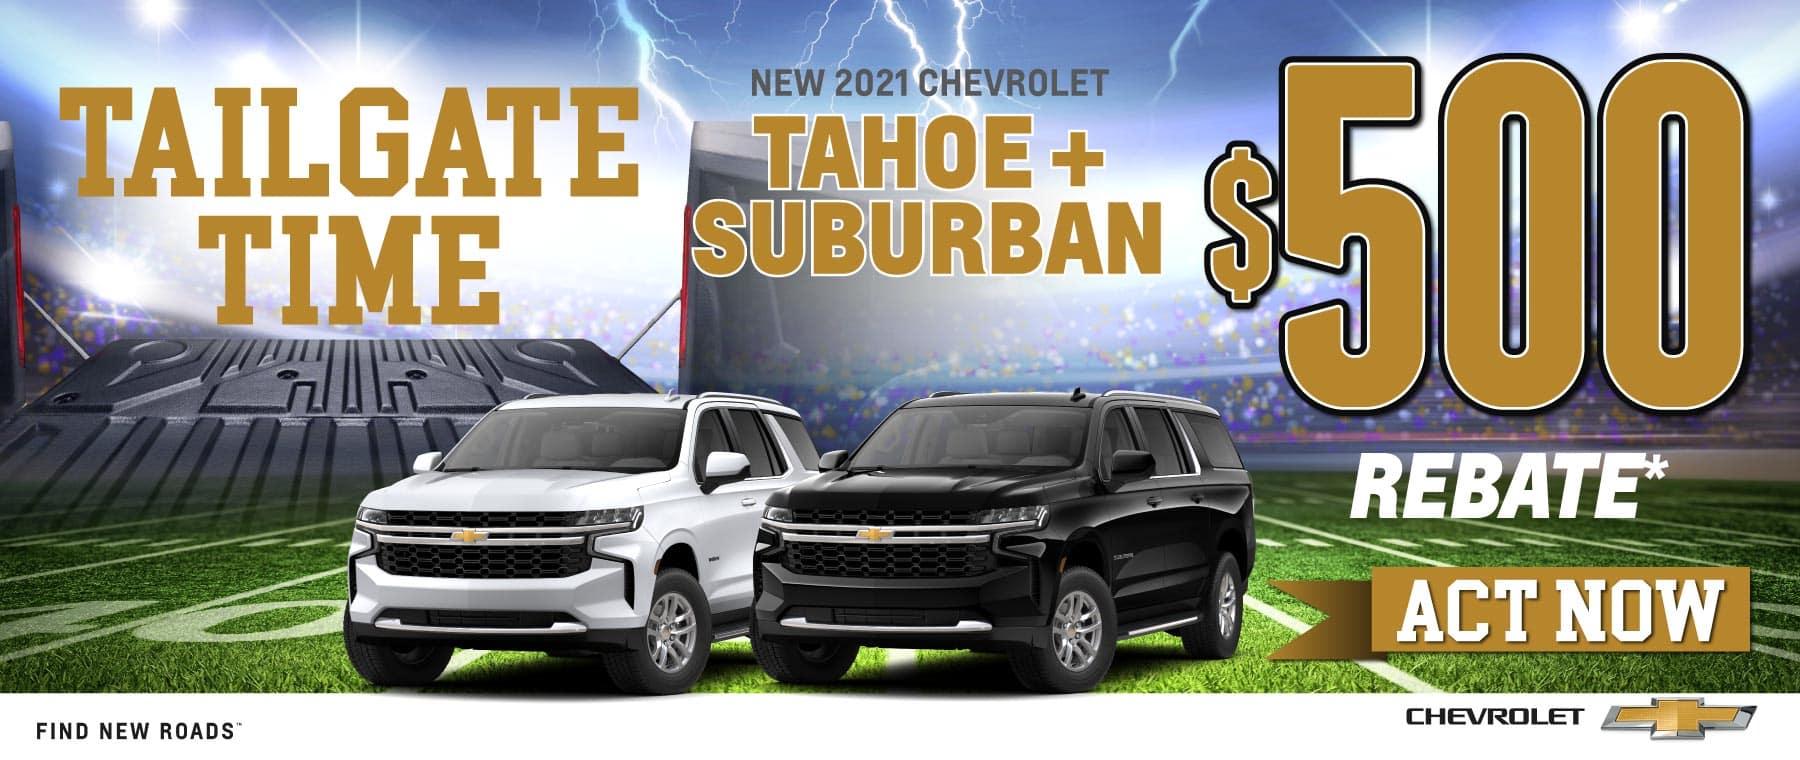 New 2021 Chevrolet Tahoe + Suburban - $500 rebate - Shop Now